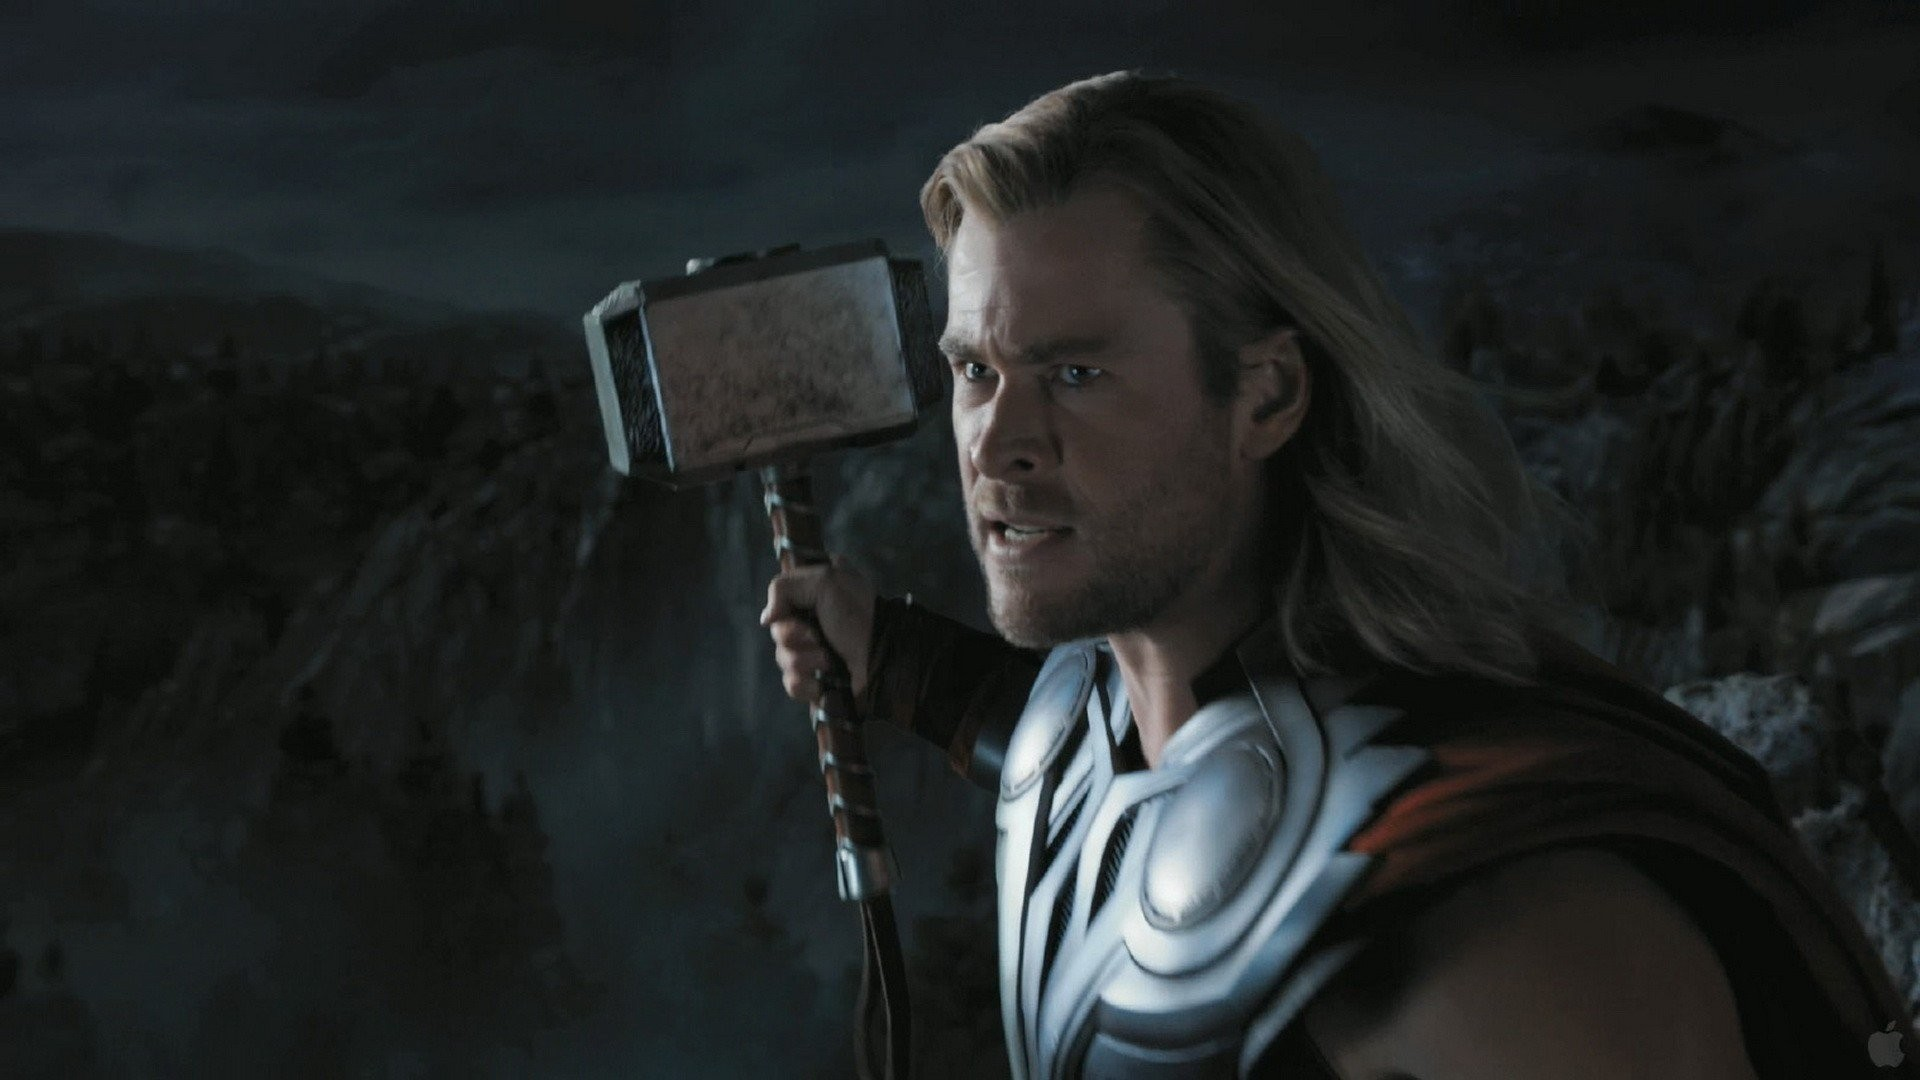 Thor hammer screenshots trailer Chris Hemsworth The Avengers (movie) Mjolnir  wallpaper     328717   WallpaperUP